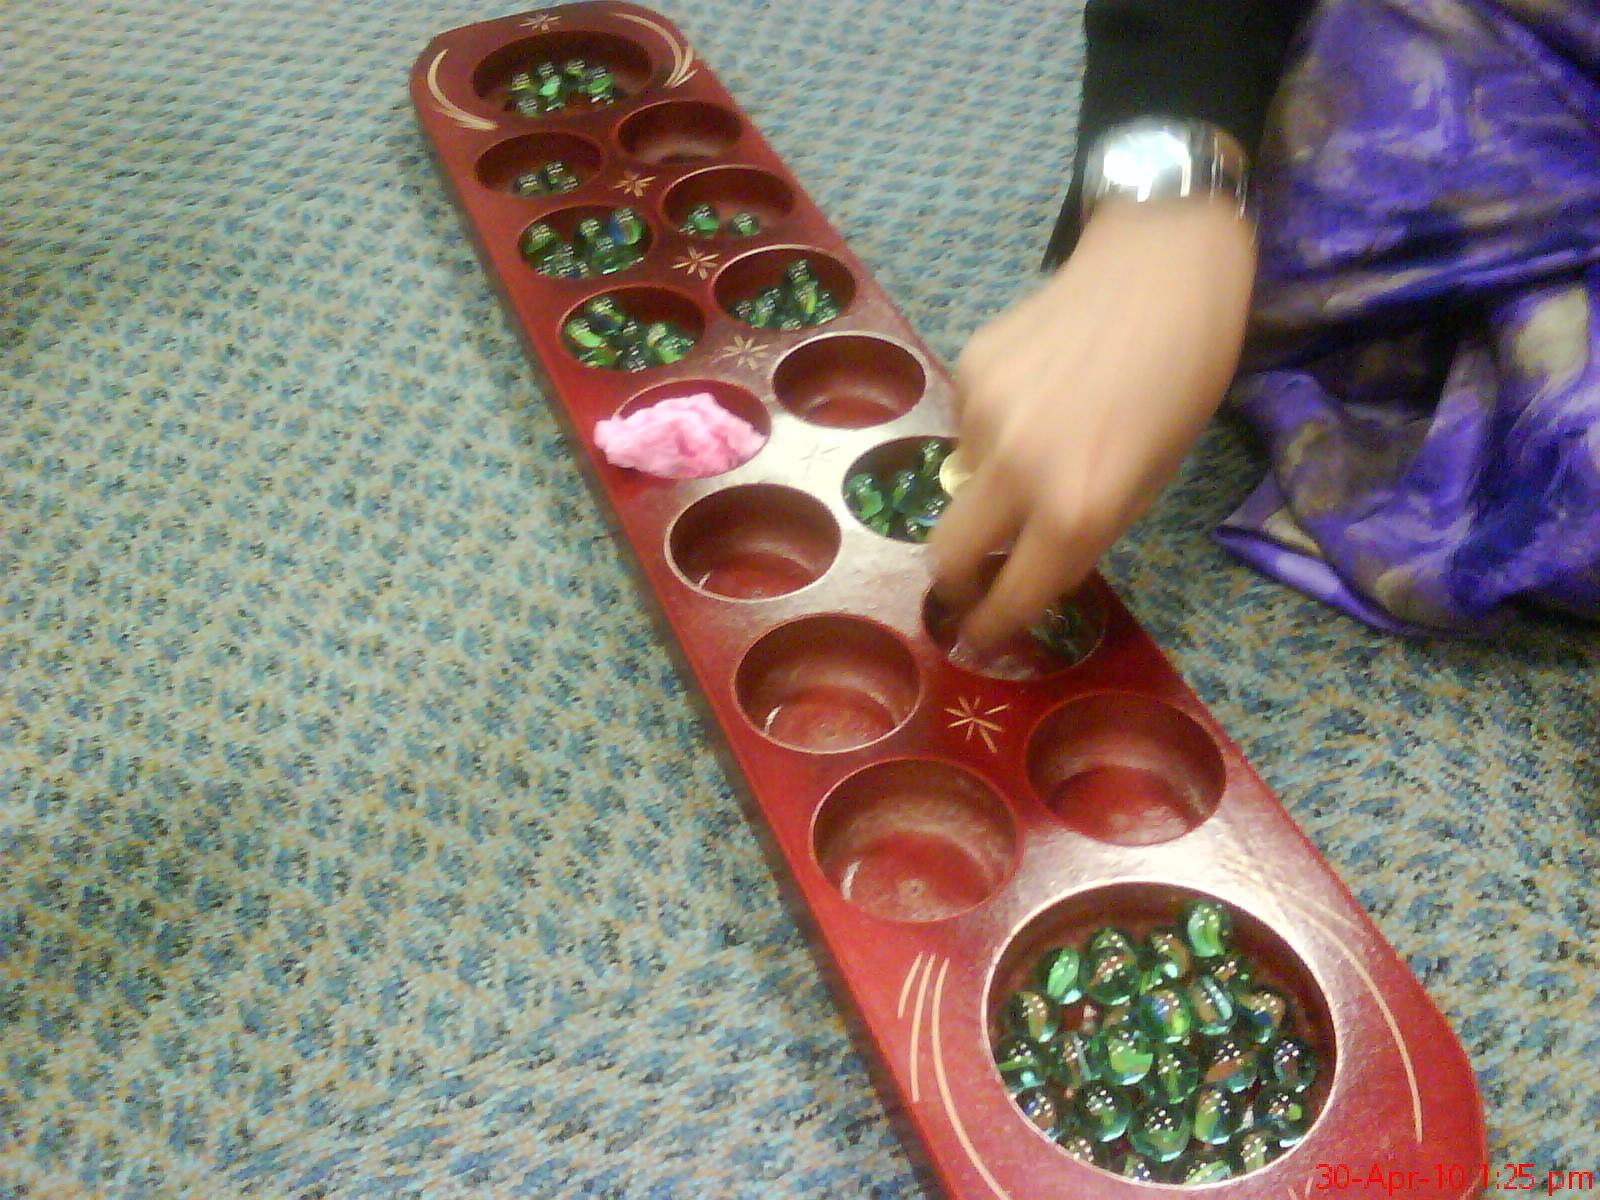 Jenis-jenis Permain Tradisional dan Penerangannya